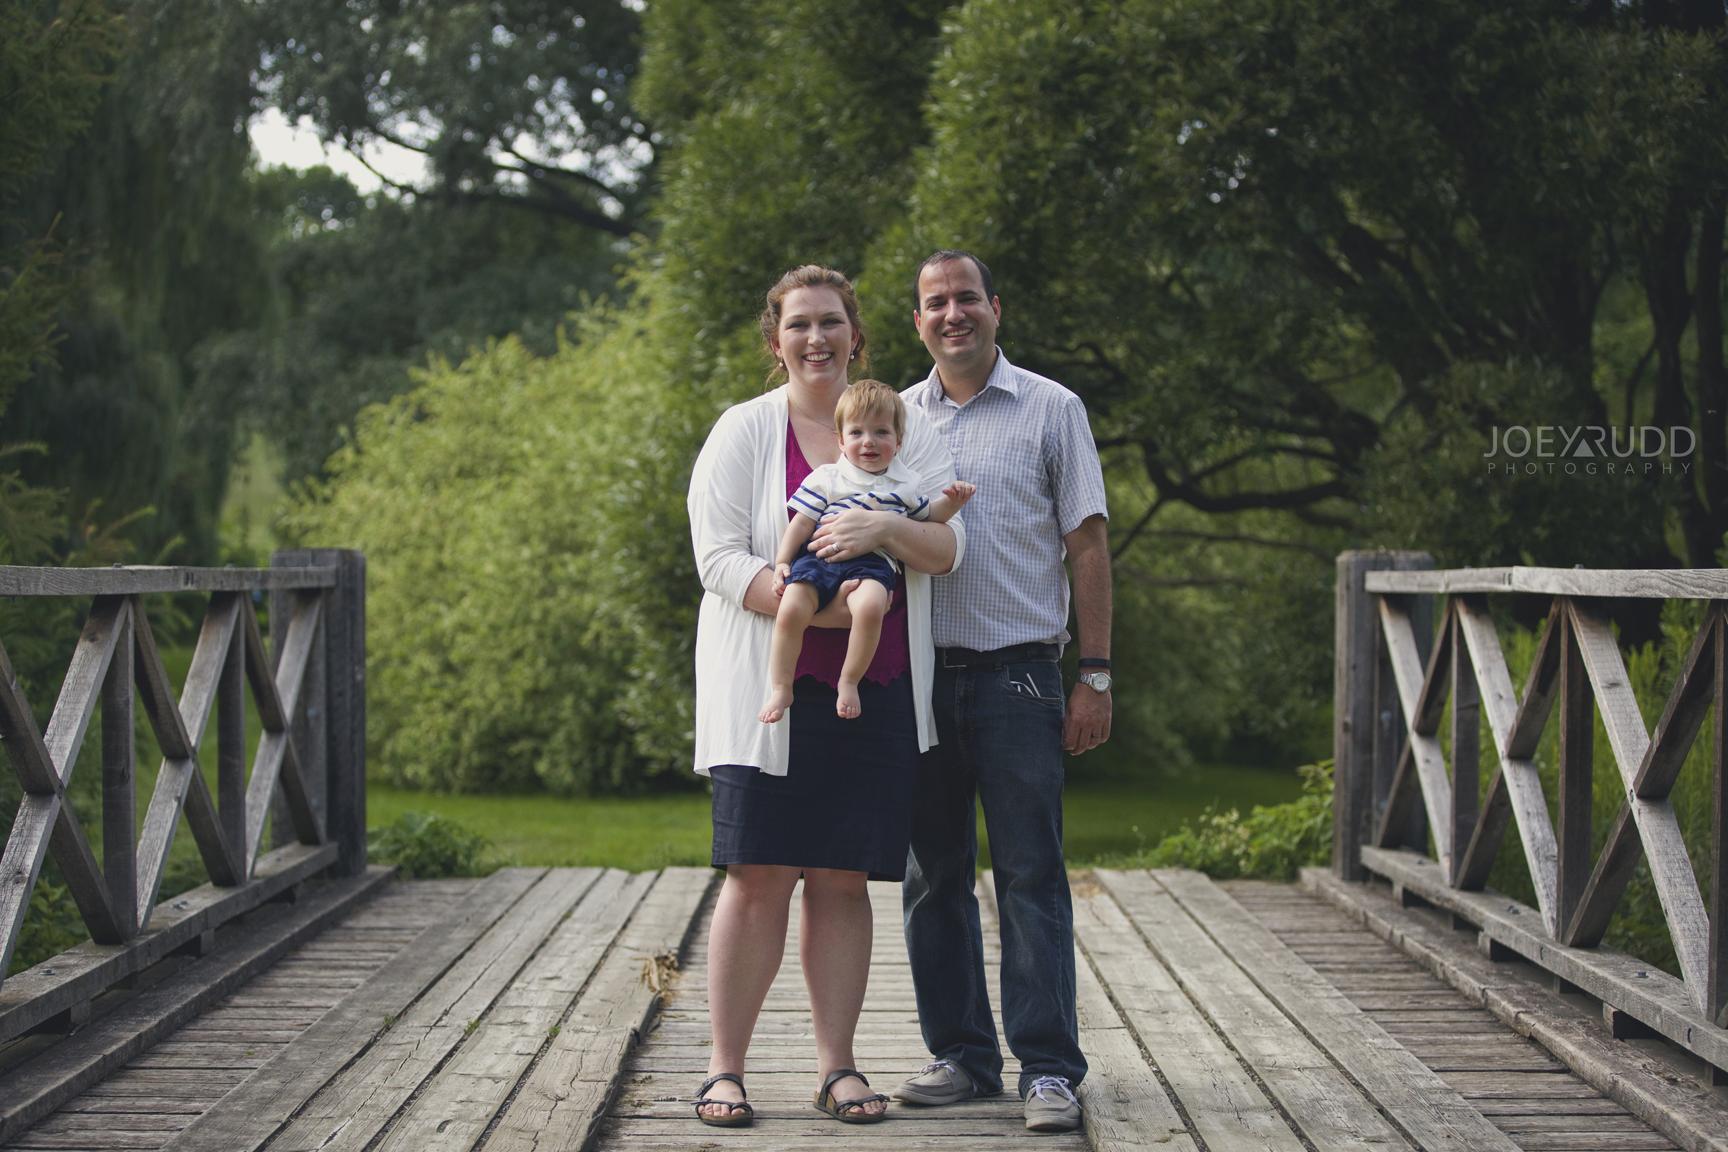 Ottawa Family Photographer Joey Rudd Photography Arboretum Bridge